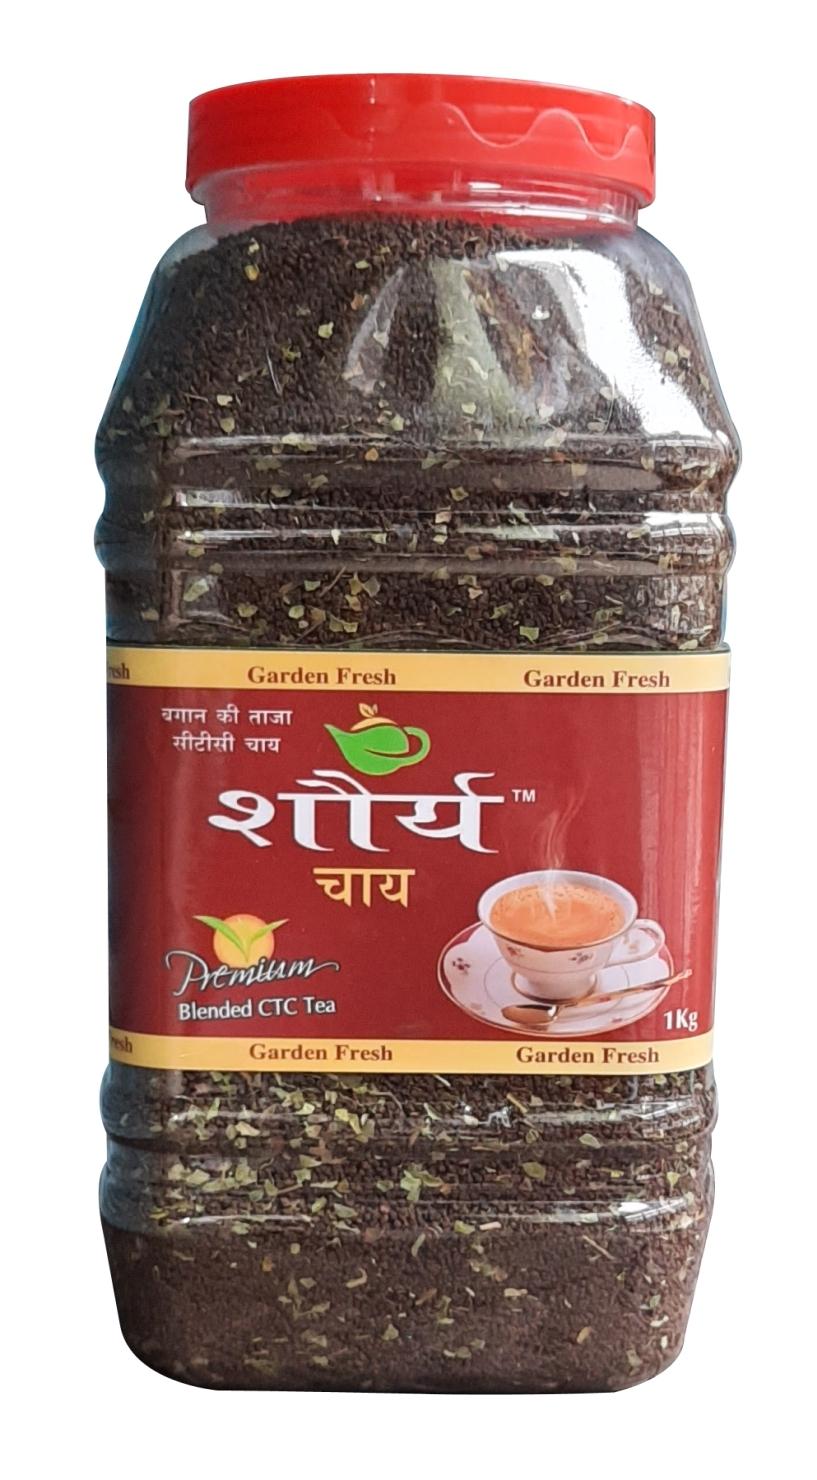 Shourya Tea Jar With Leaf - 1.0 Kgs